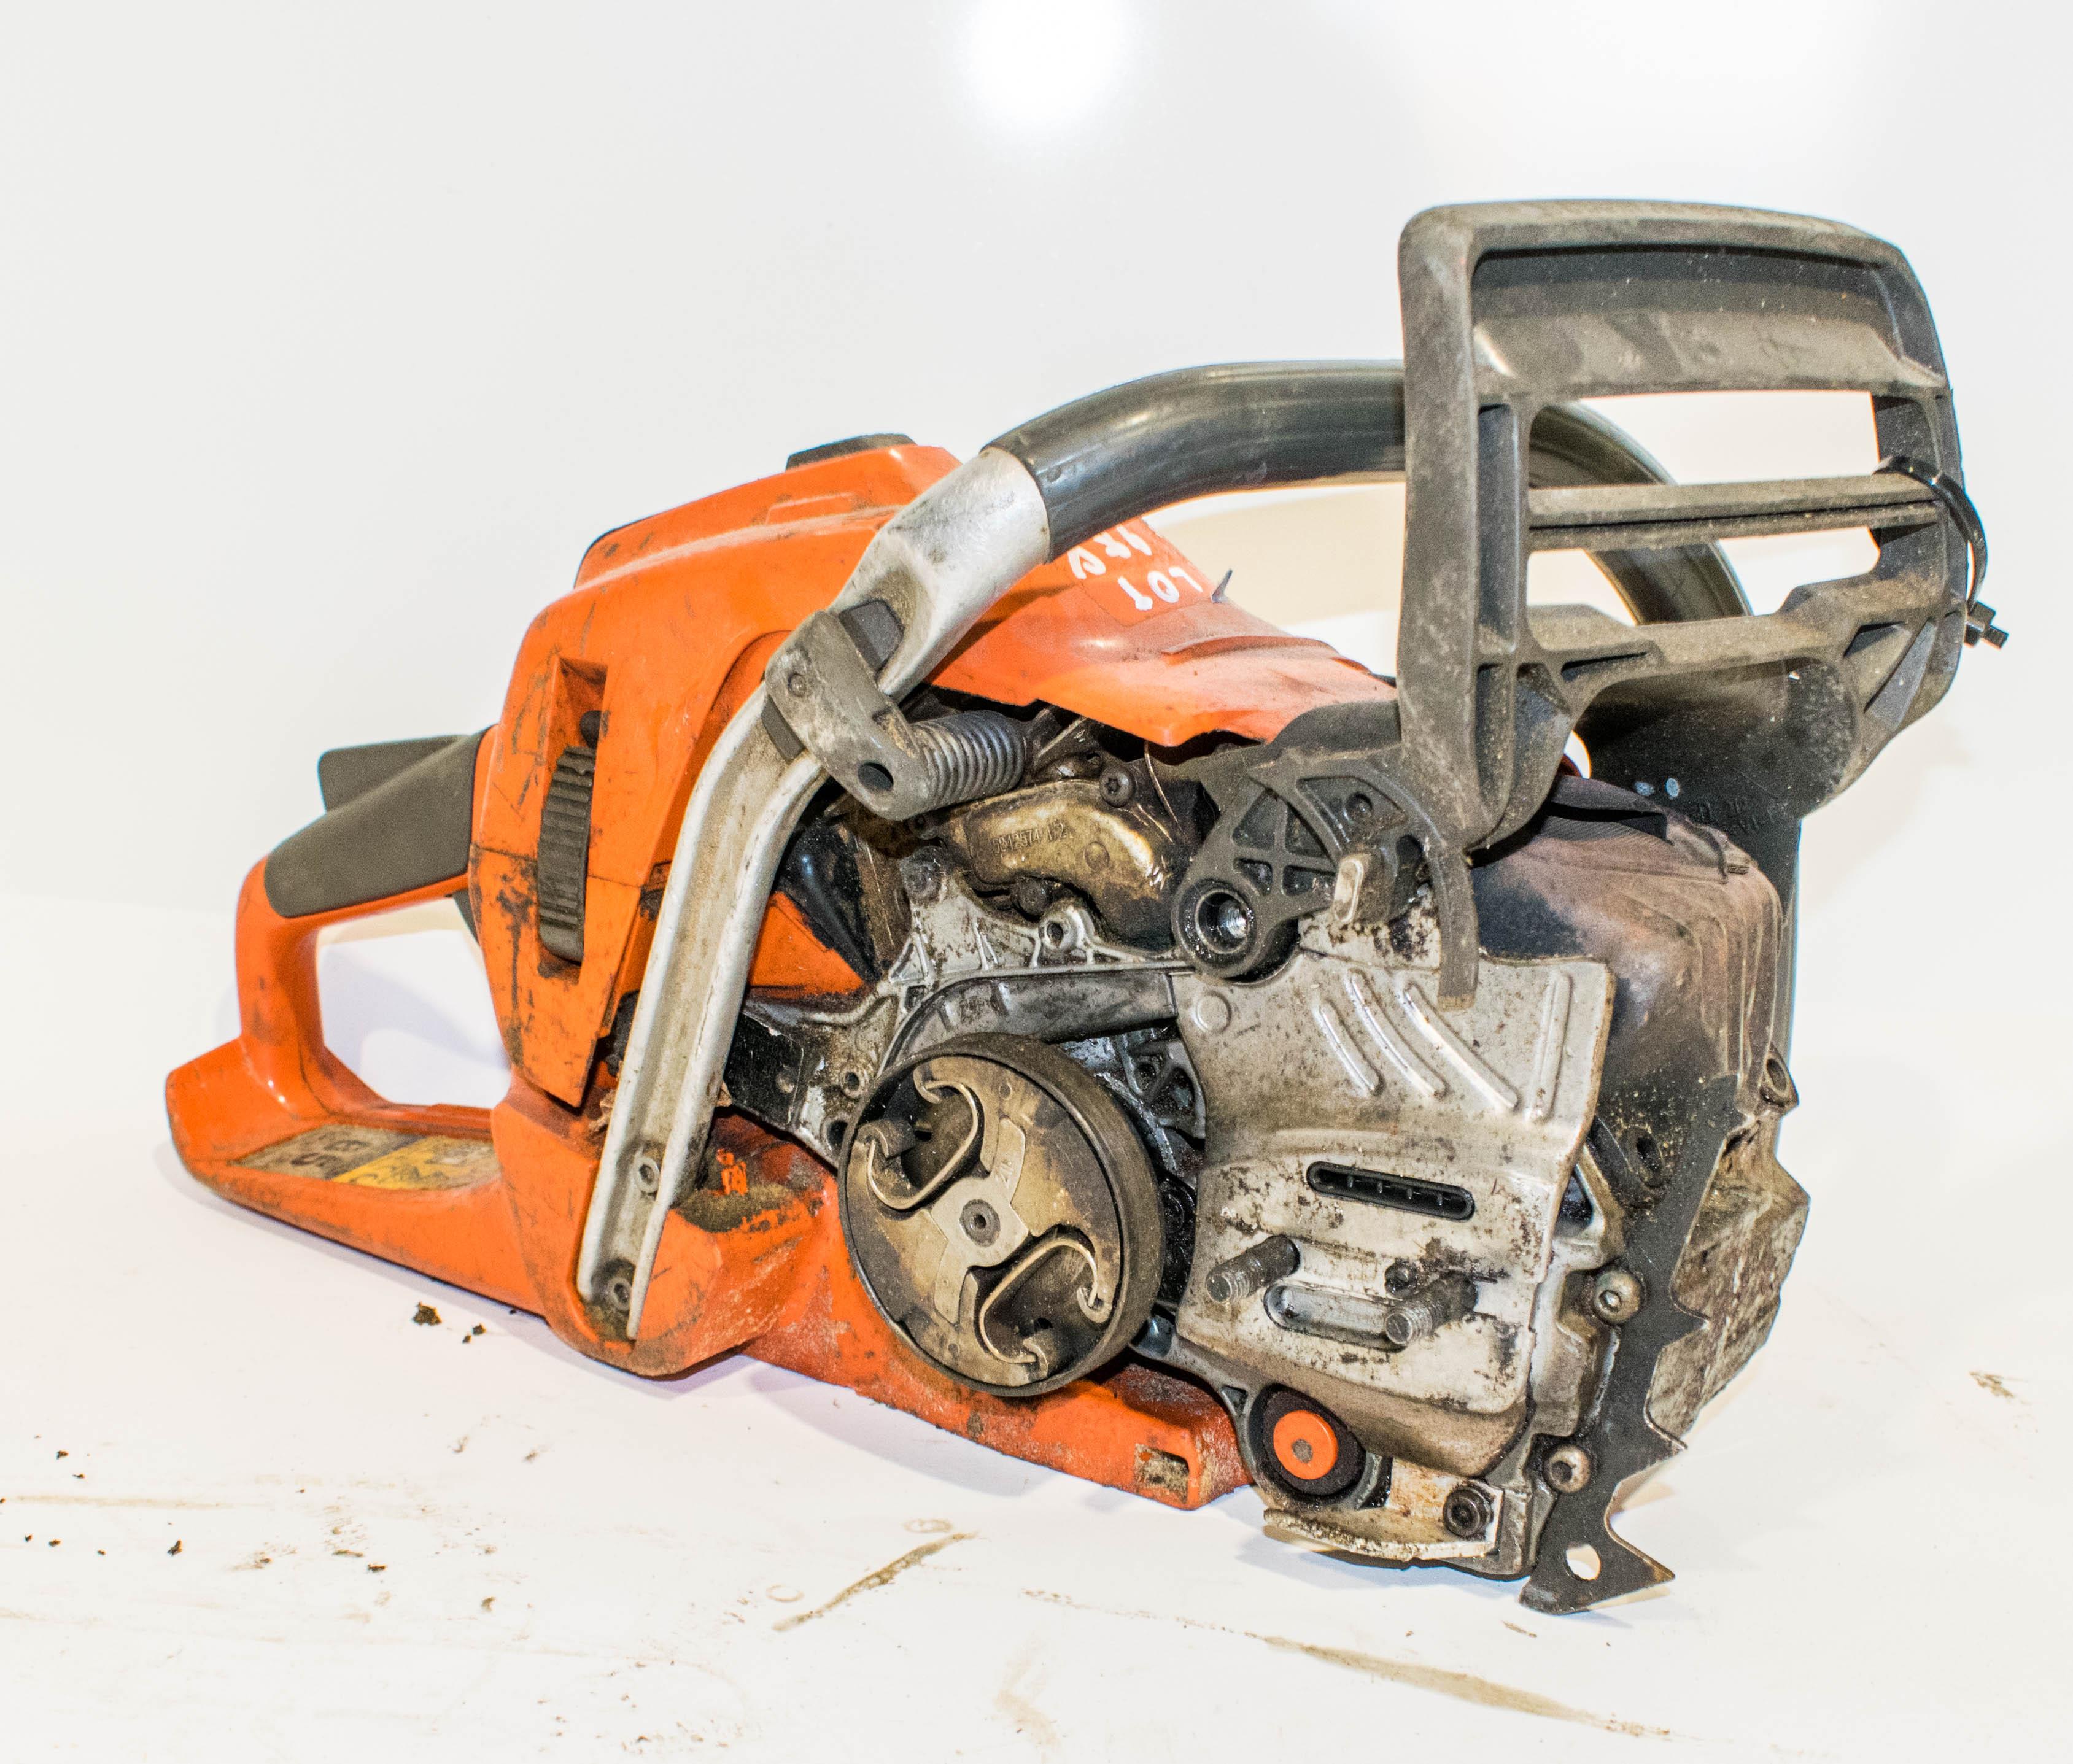 Lot 988 - Husqvarna petrol driven chainsaw ** no blade or bar **